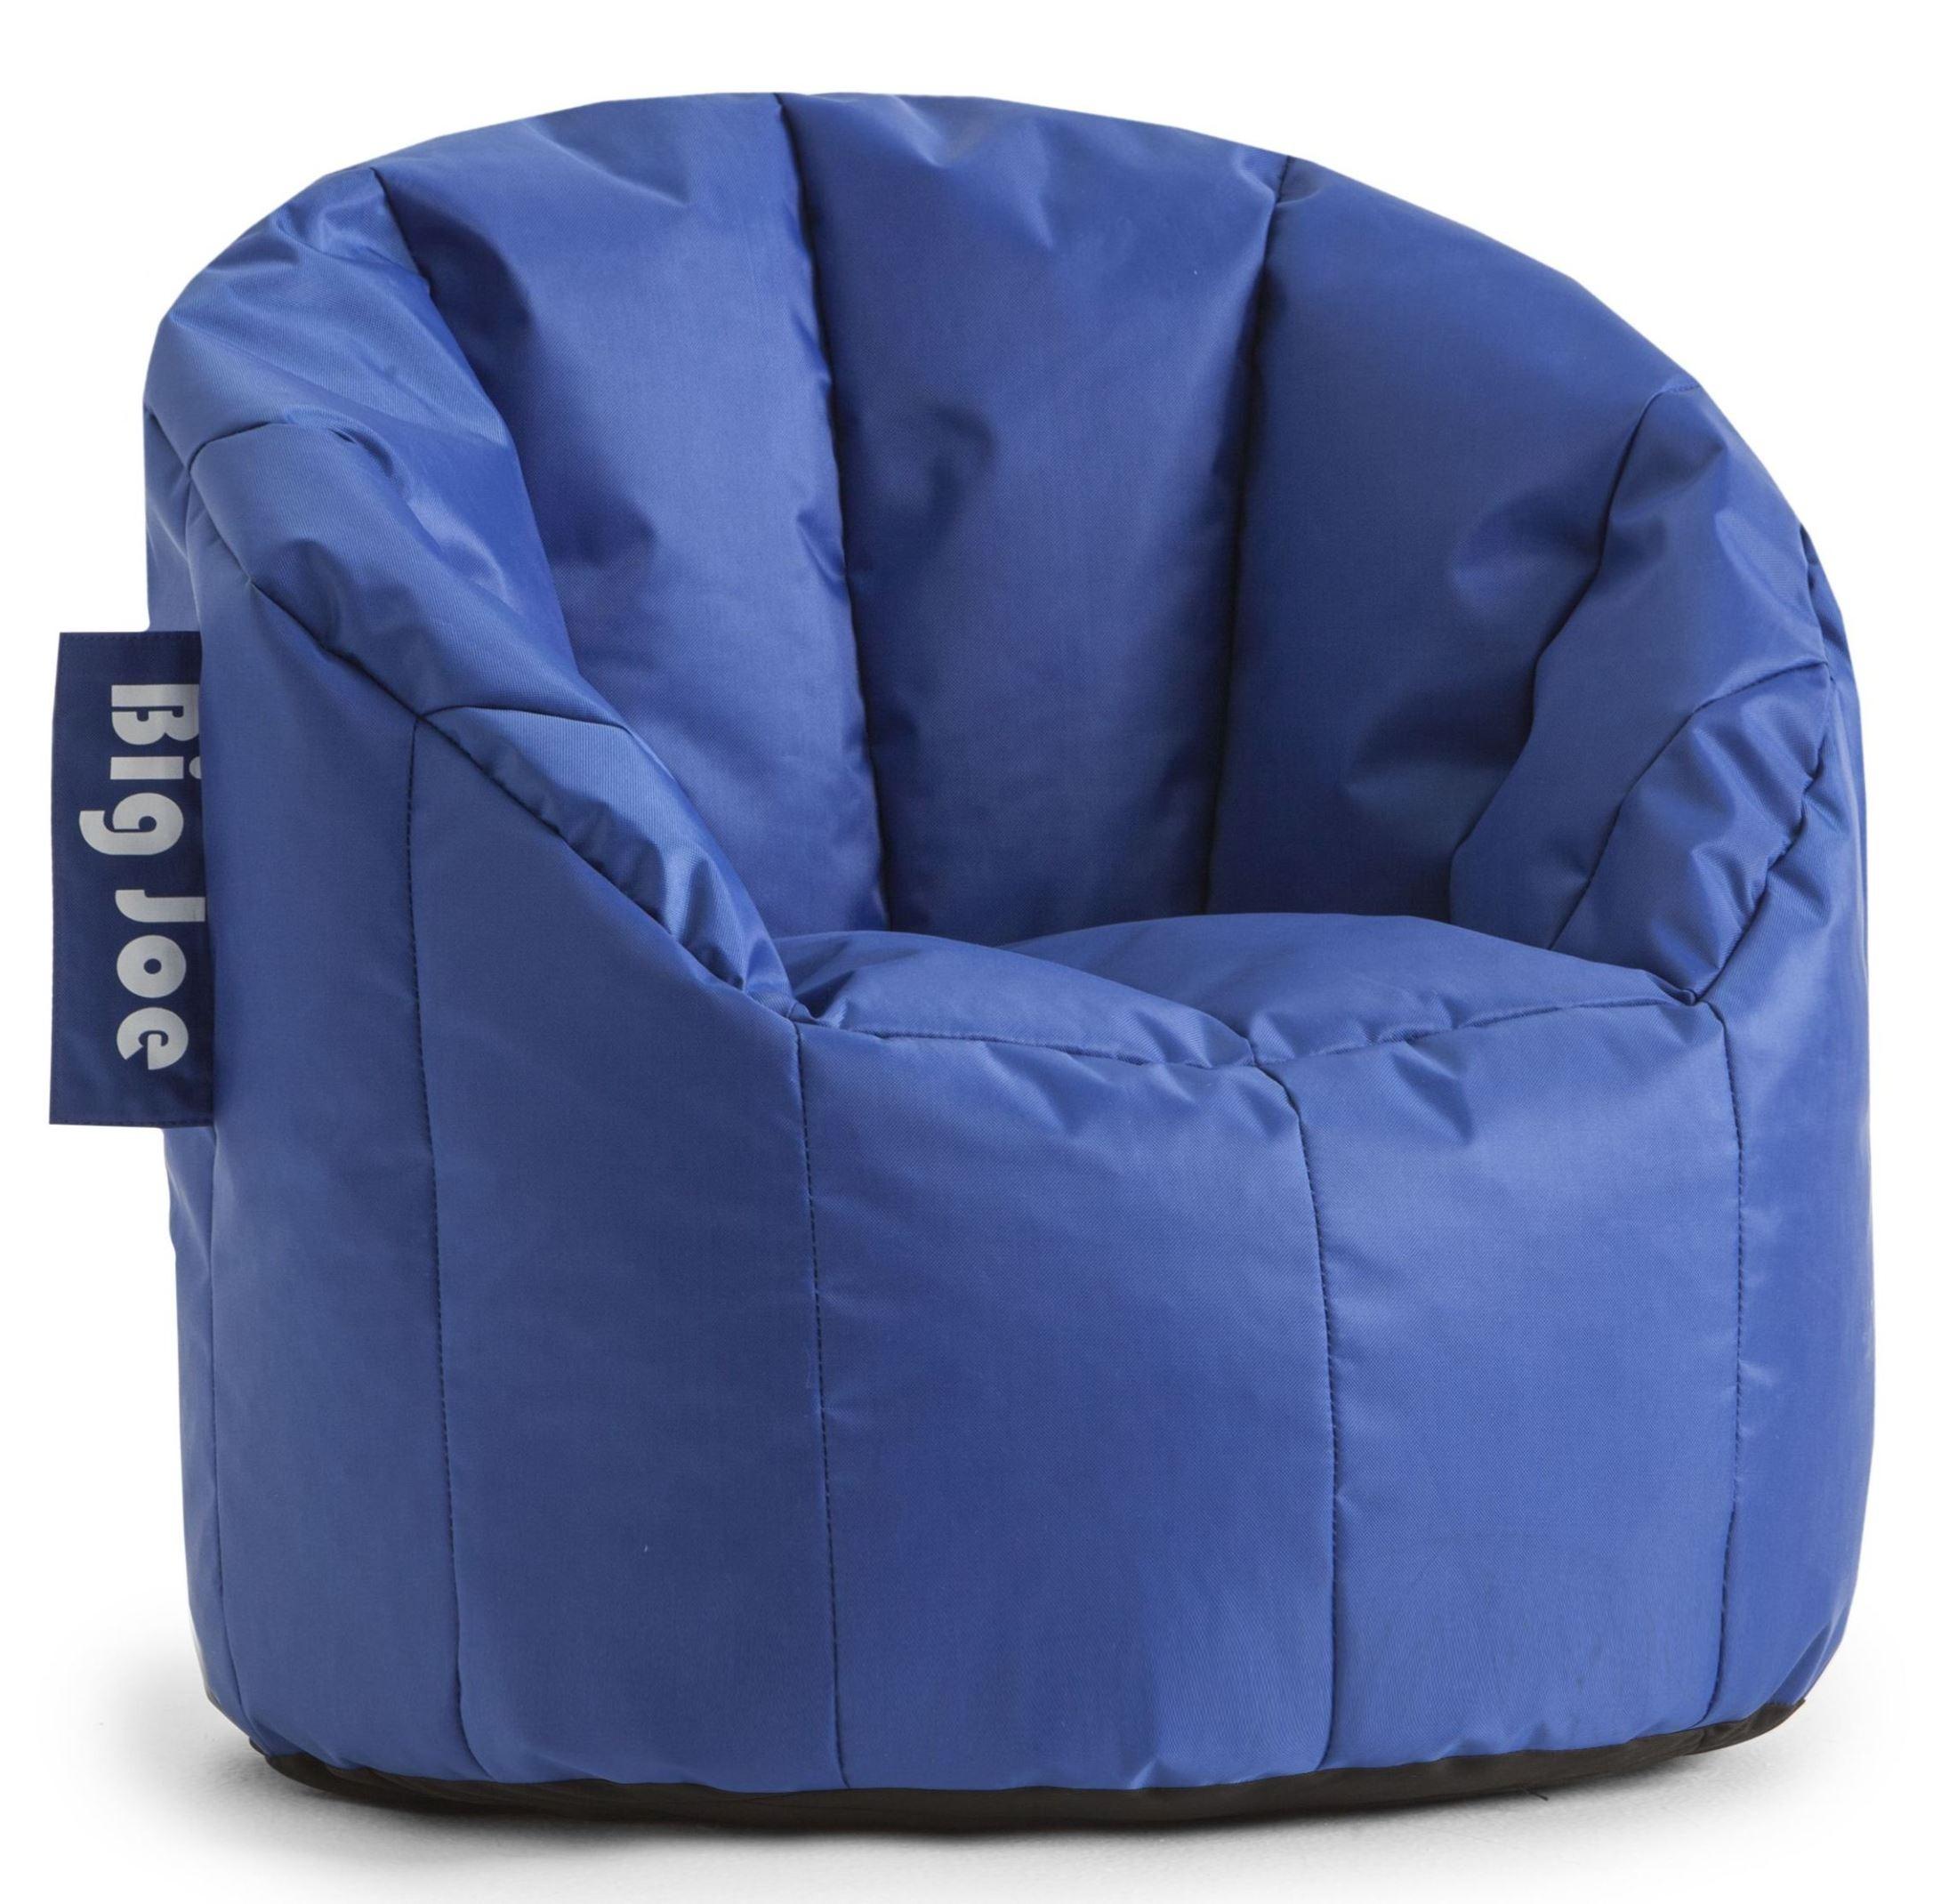 big joe lumin chair target brookline dining kids sapphire smartmax from comfort